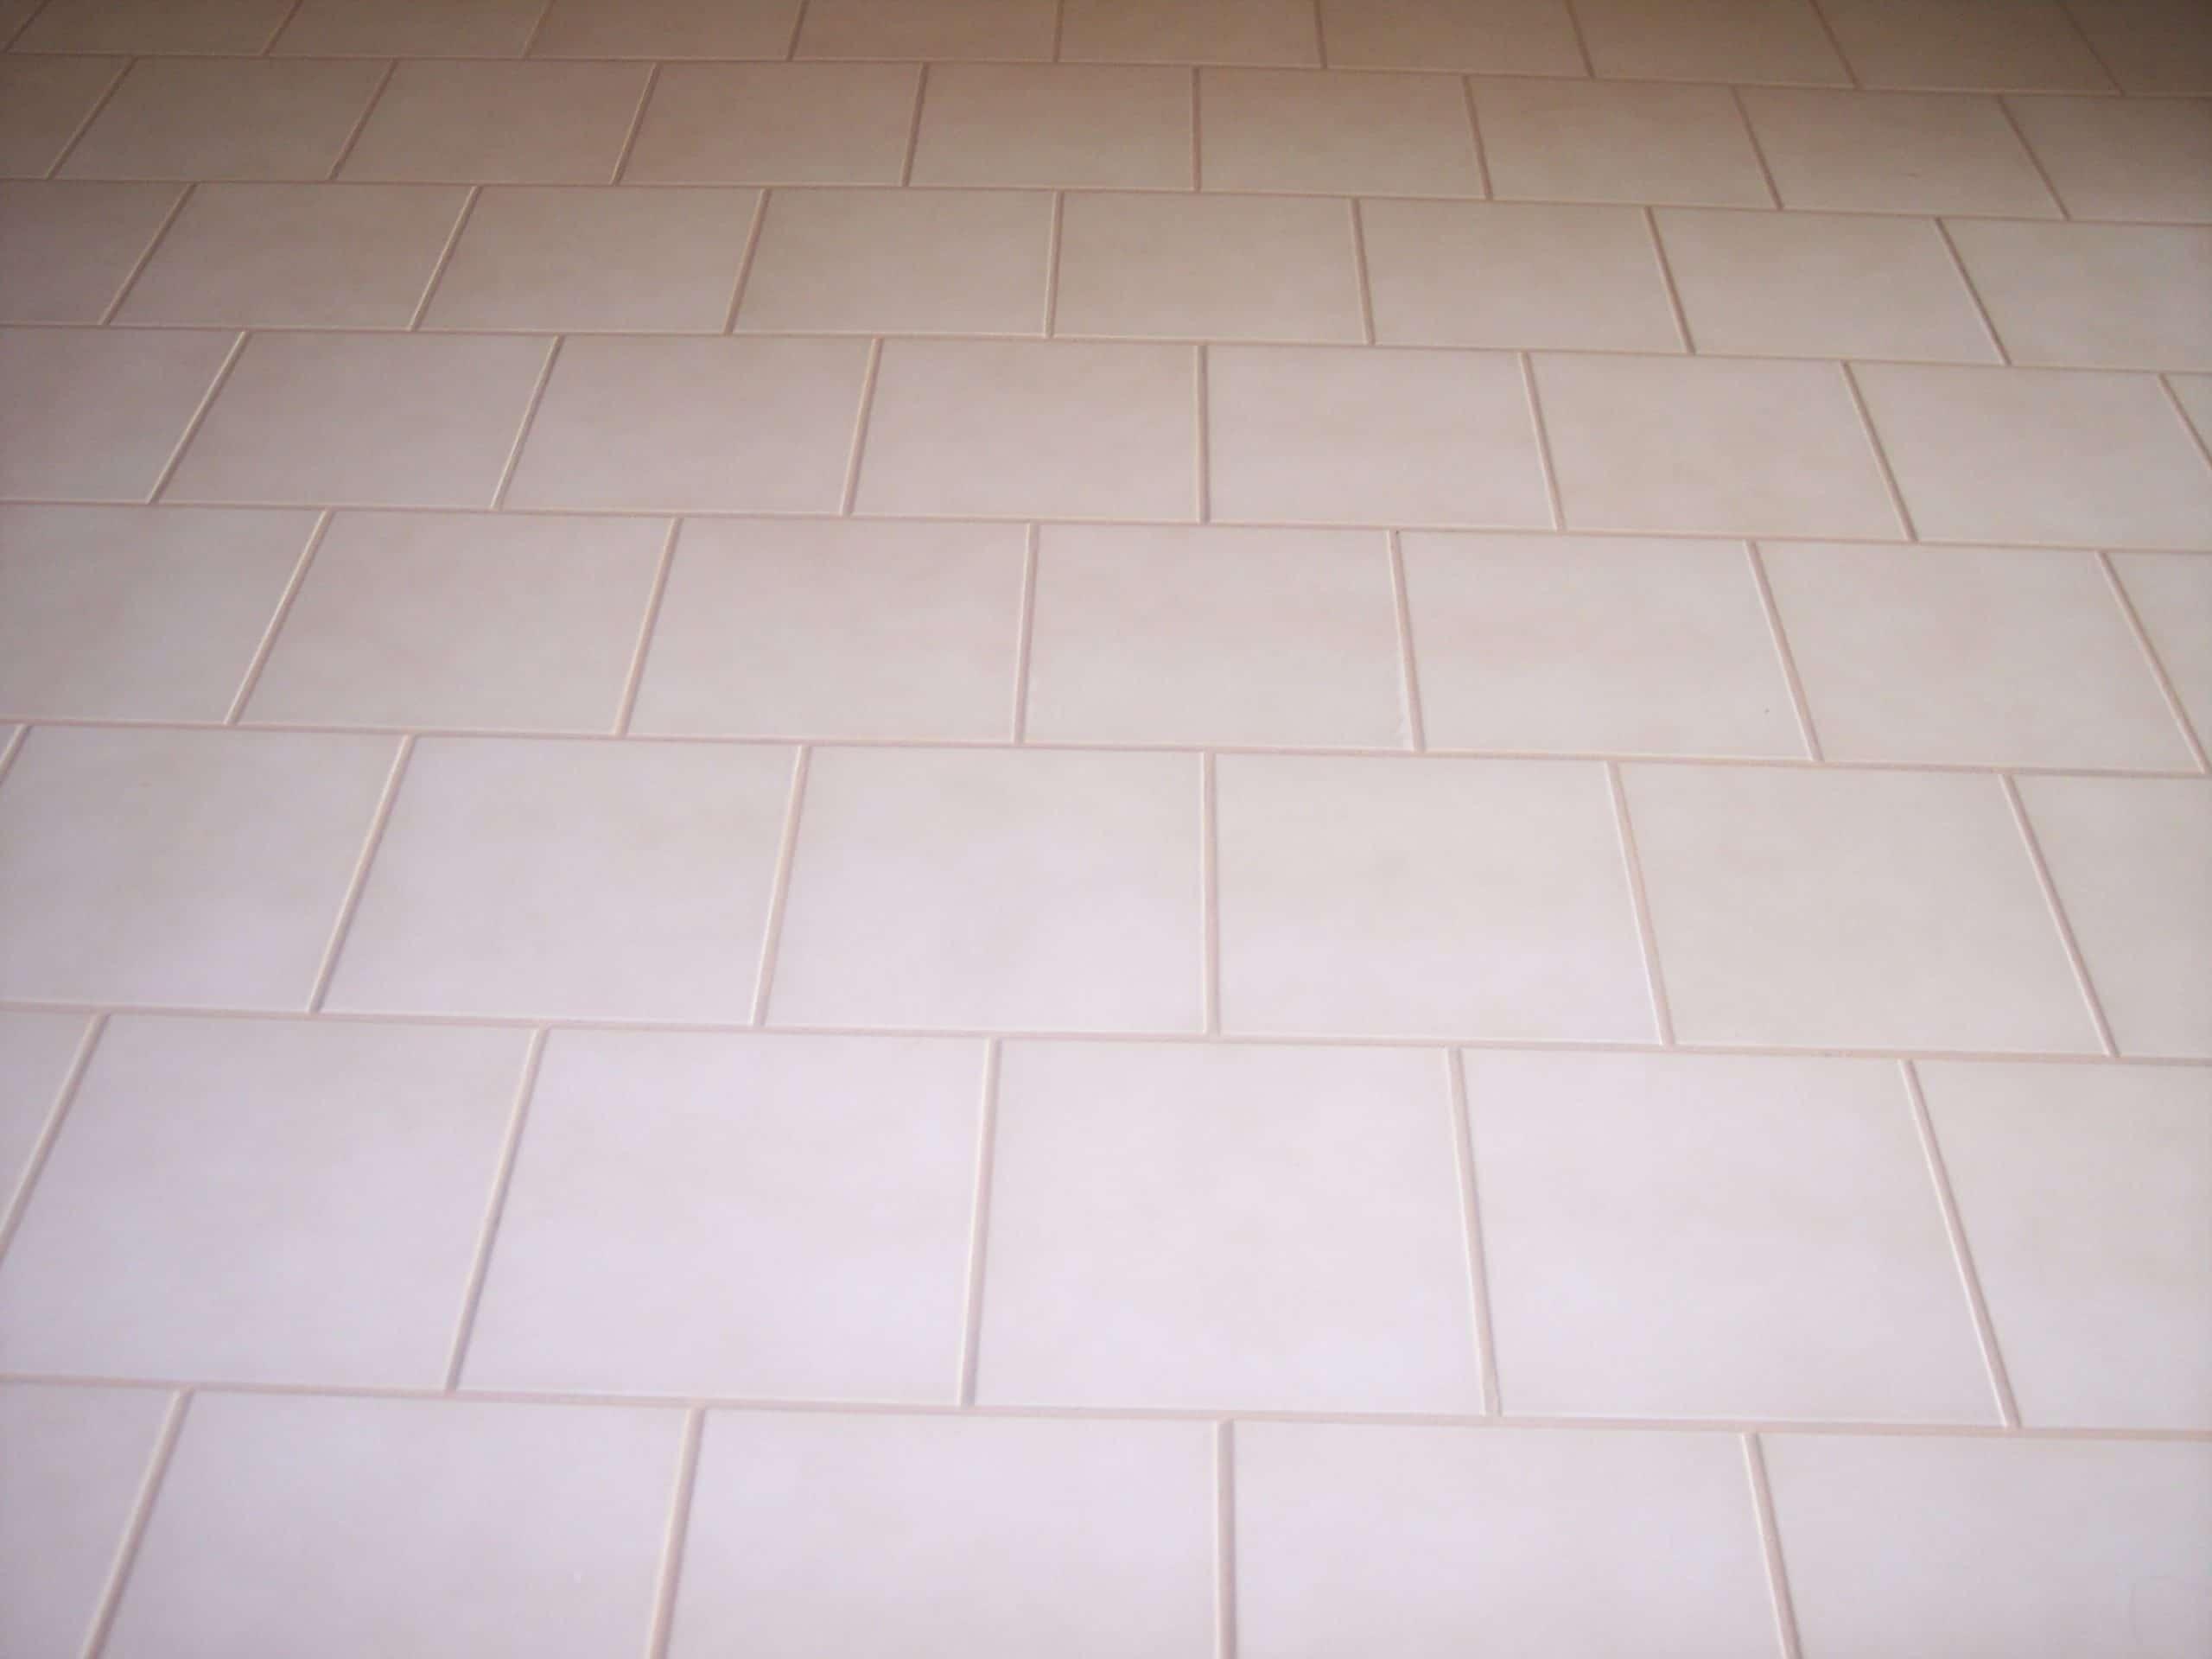 How To Care For Ceramic Tile Floors Tile Design Ideas